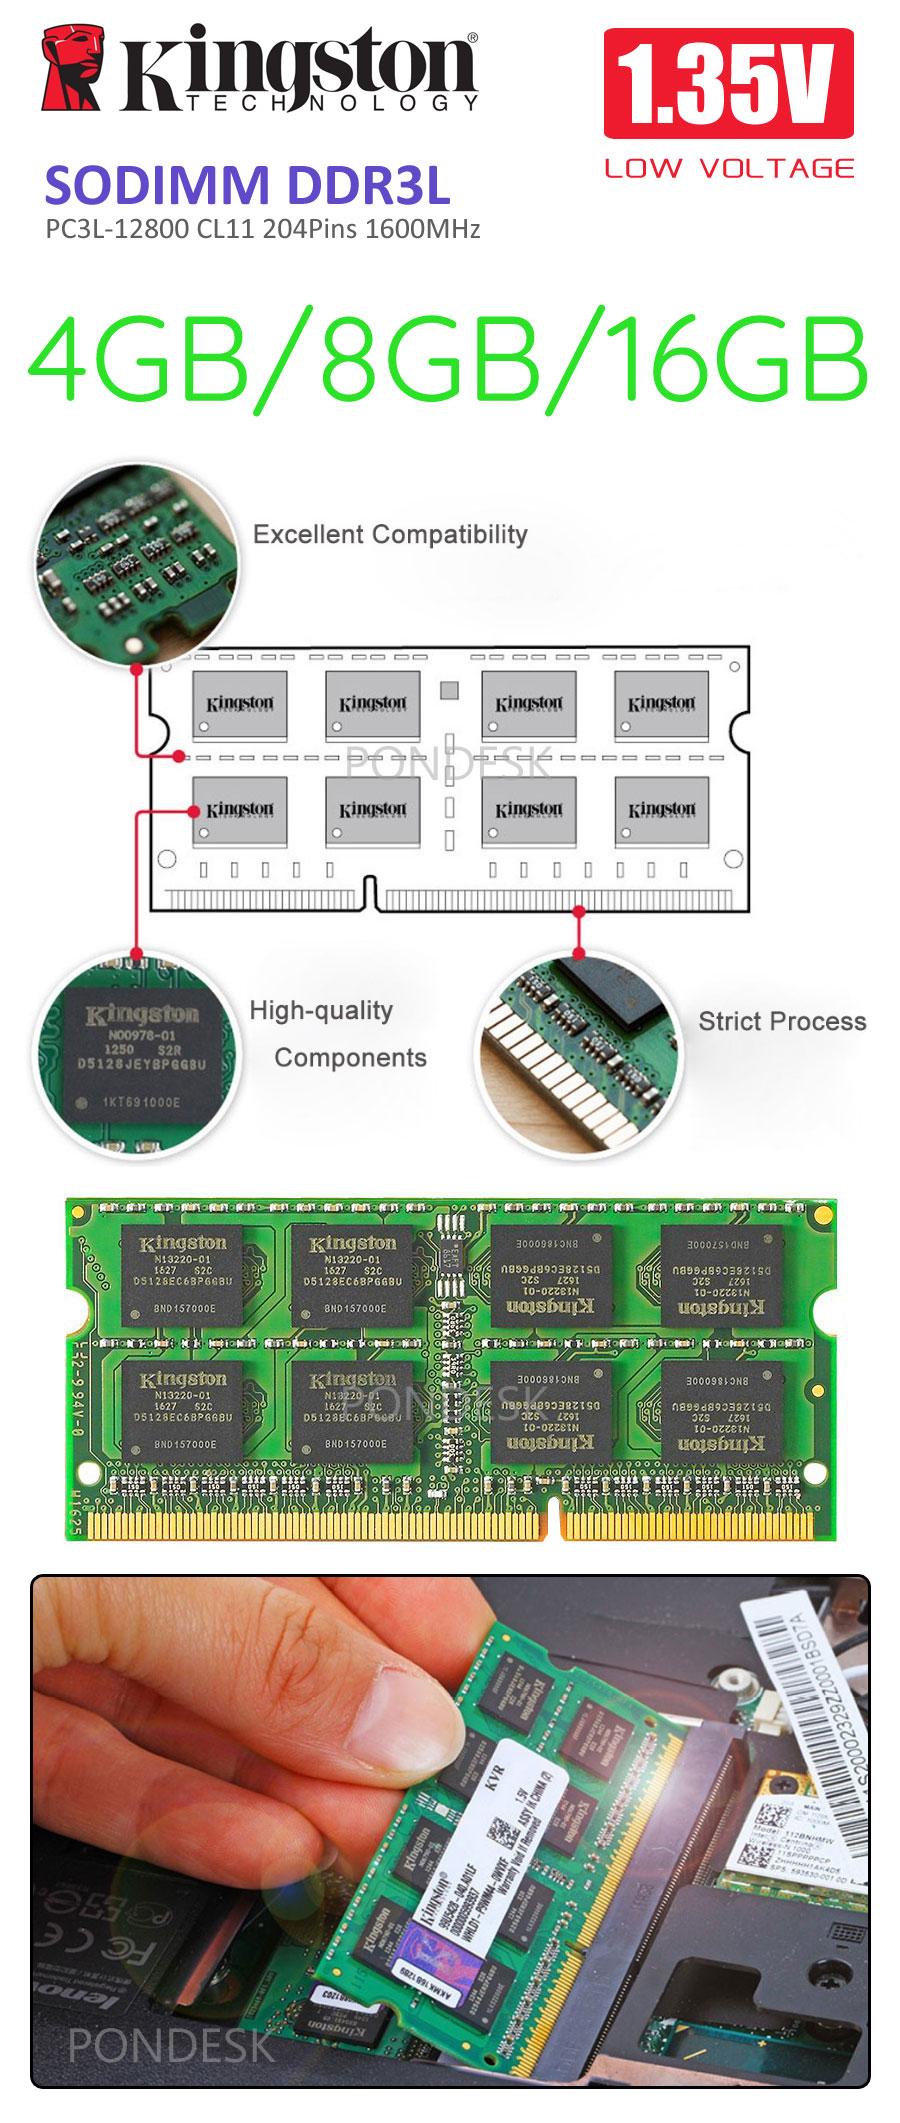 Kingston SODIMM DDR3L 1600MHz 1.35V PC3L 4GB/8GB/16GB Memory - RMHO-001   Image